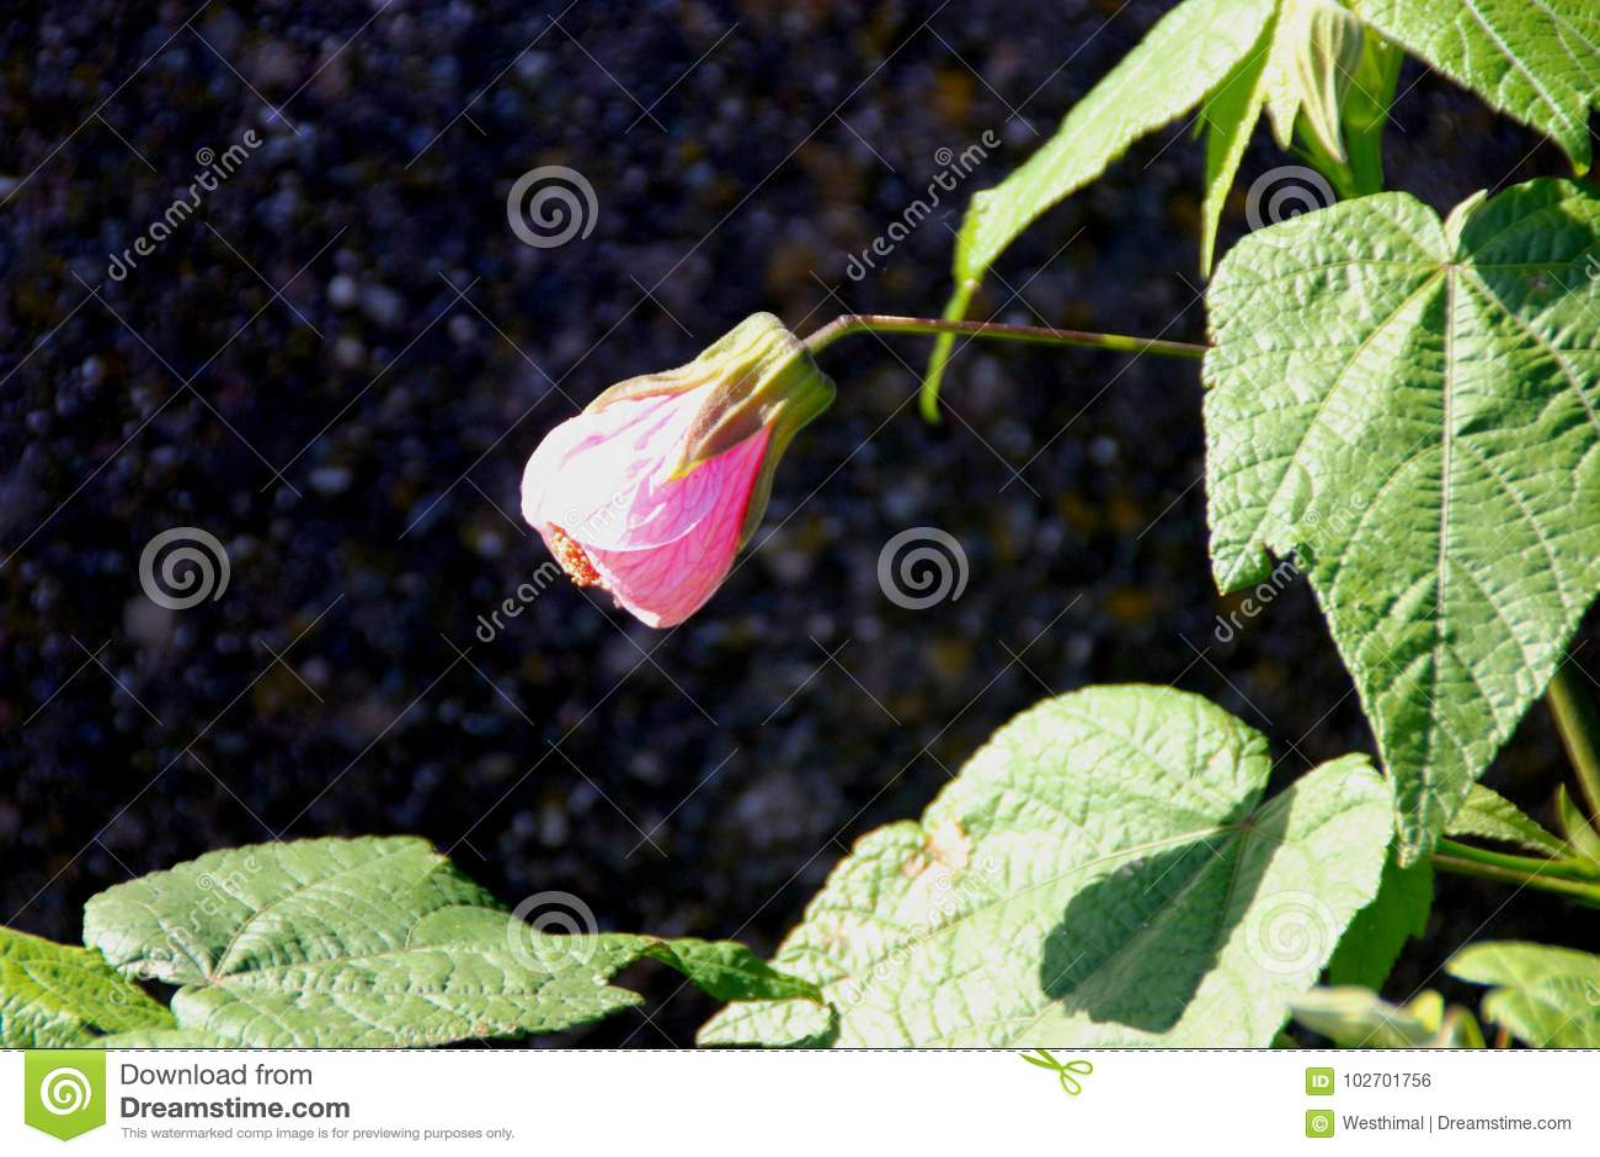 Flowering Maple Abutilon Hybridum Stock Photo Image Of Different